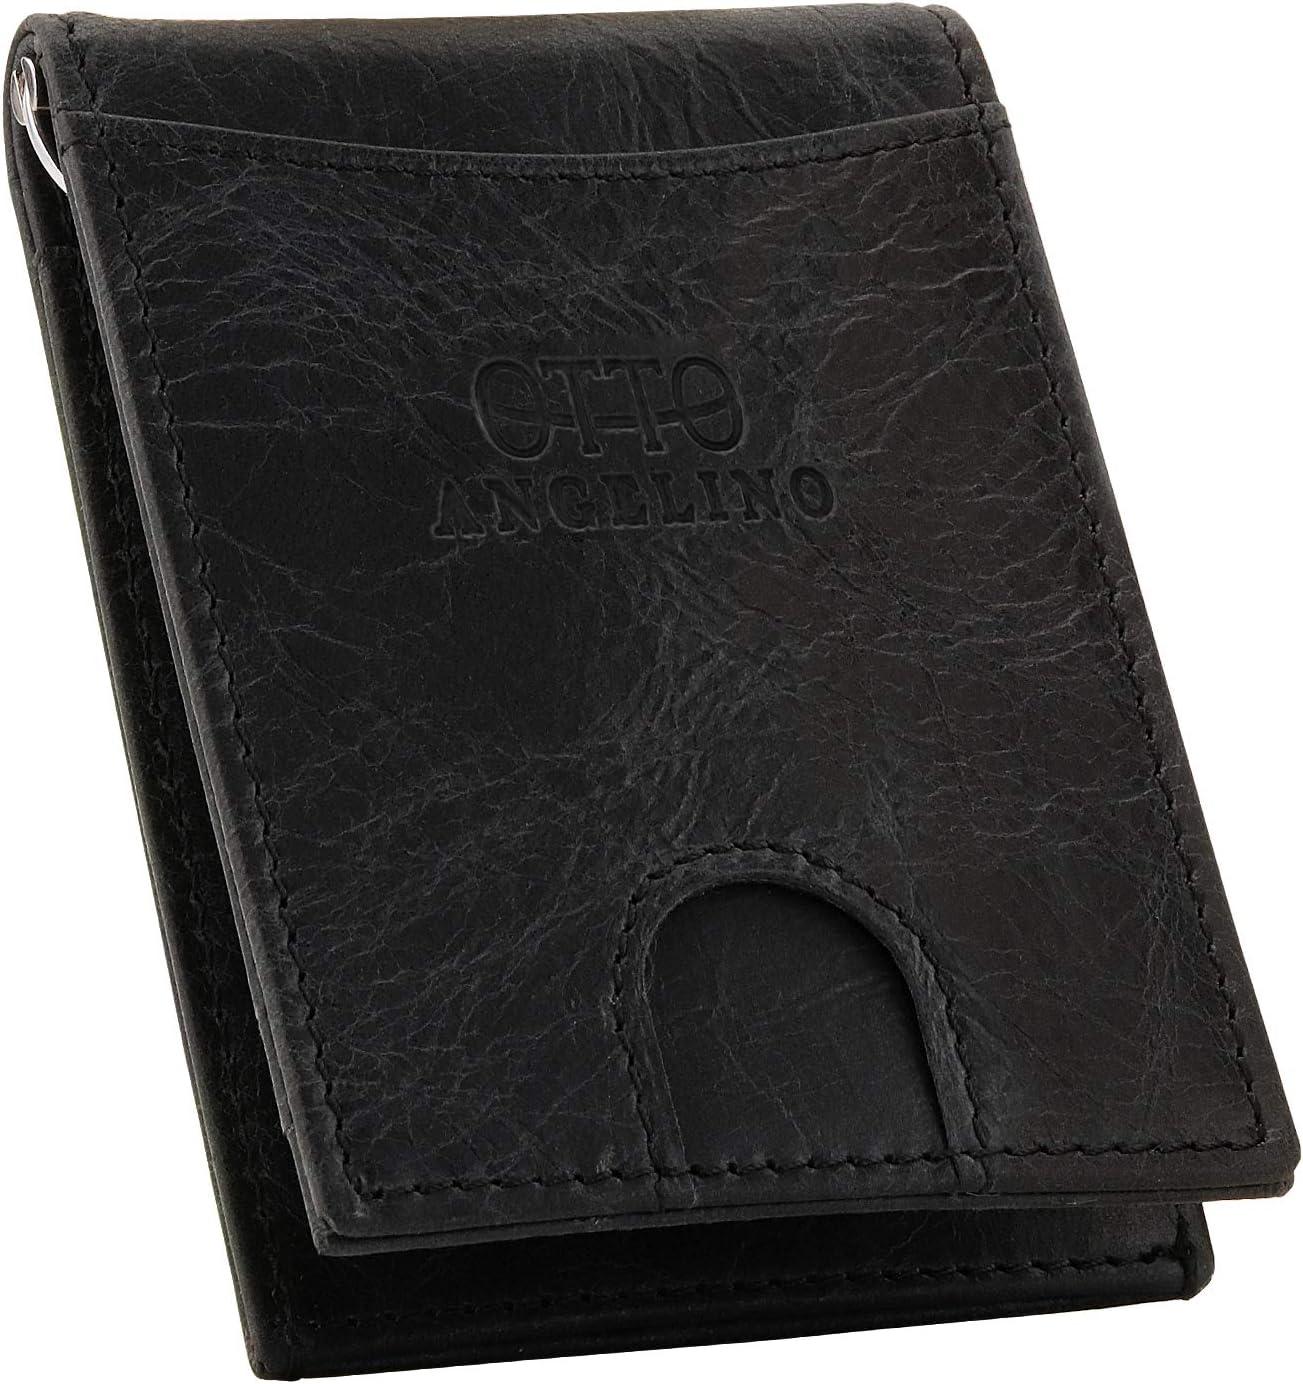 Otto Angelino Top Grain Leather Wallet with Money Clip - RFID Blocking – Unisex